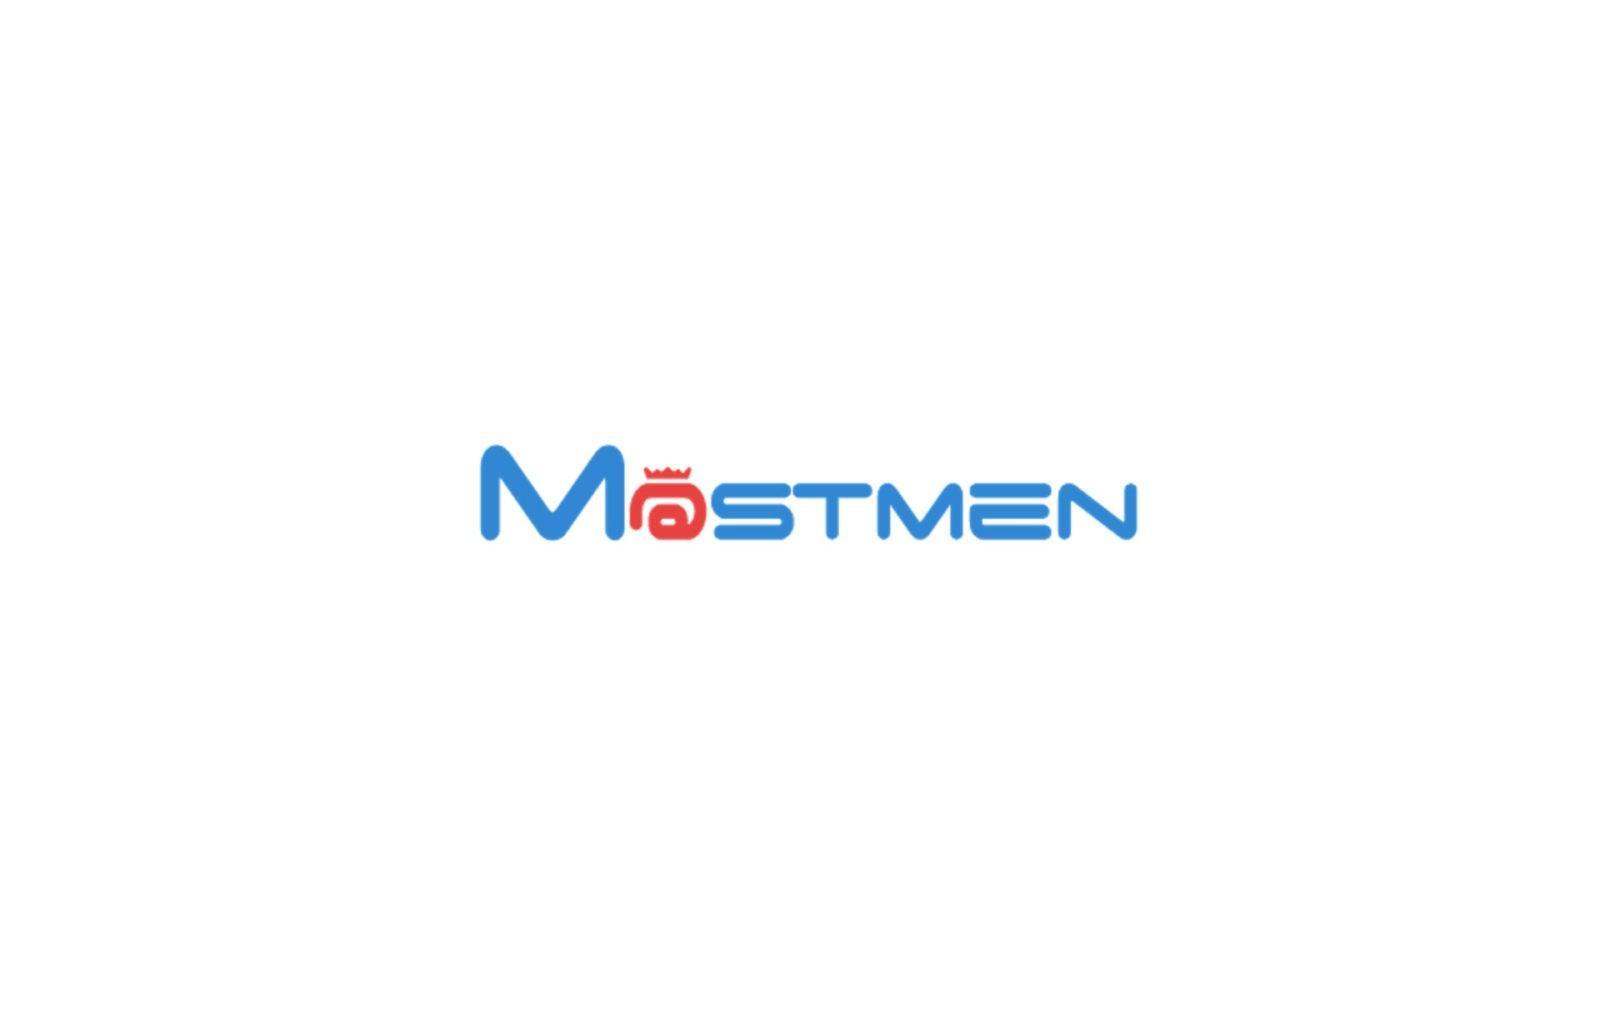 mastmen logo